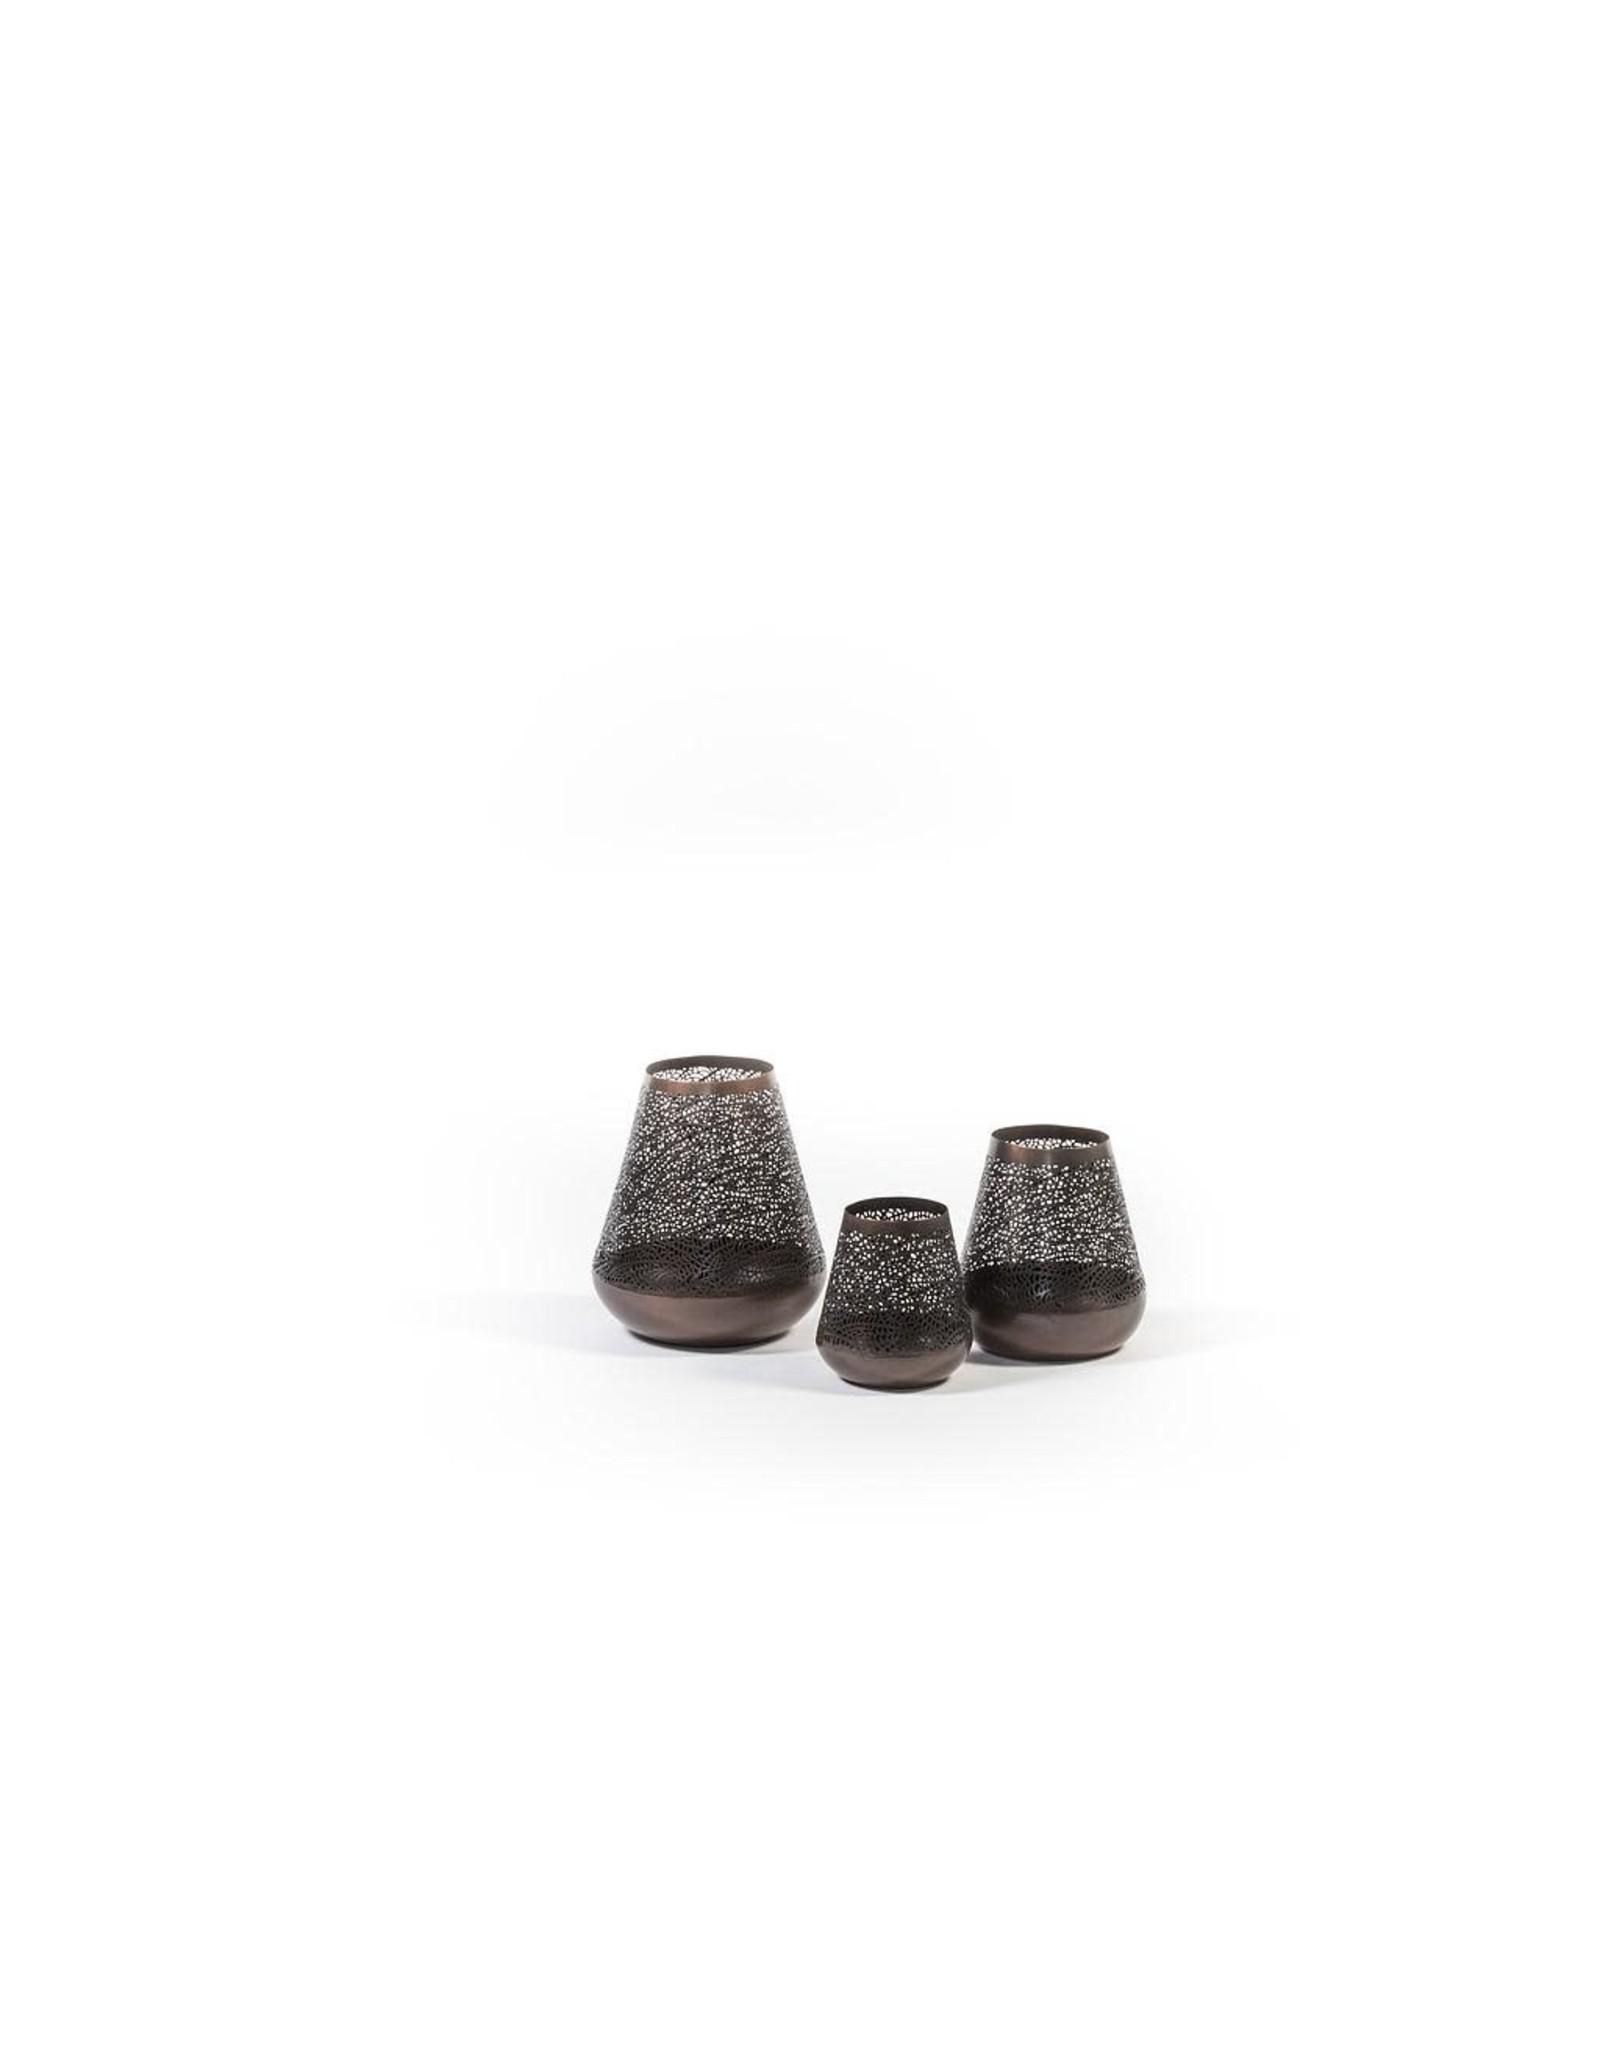 Dekocandle Antique Tlight Holder - Metal - Dark Copper - Medium